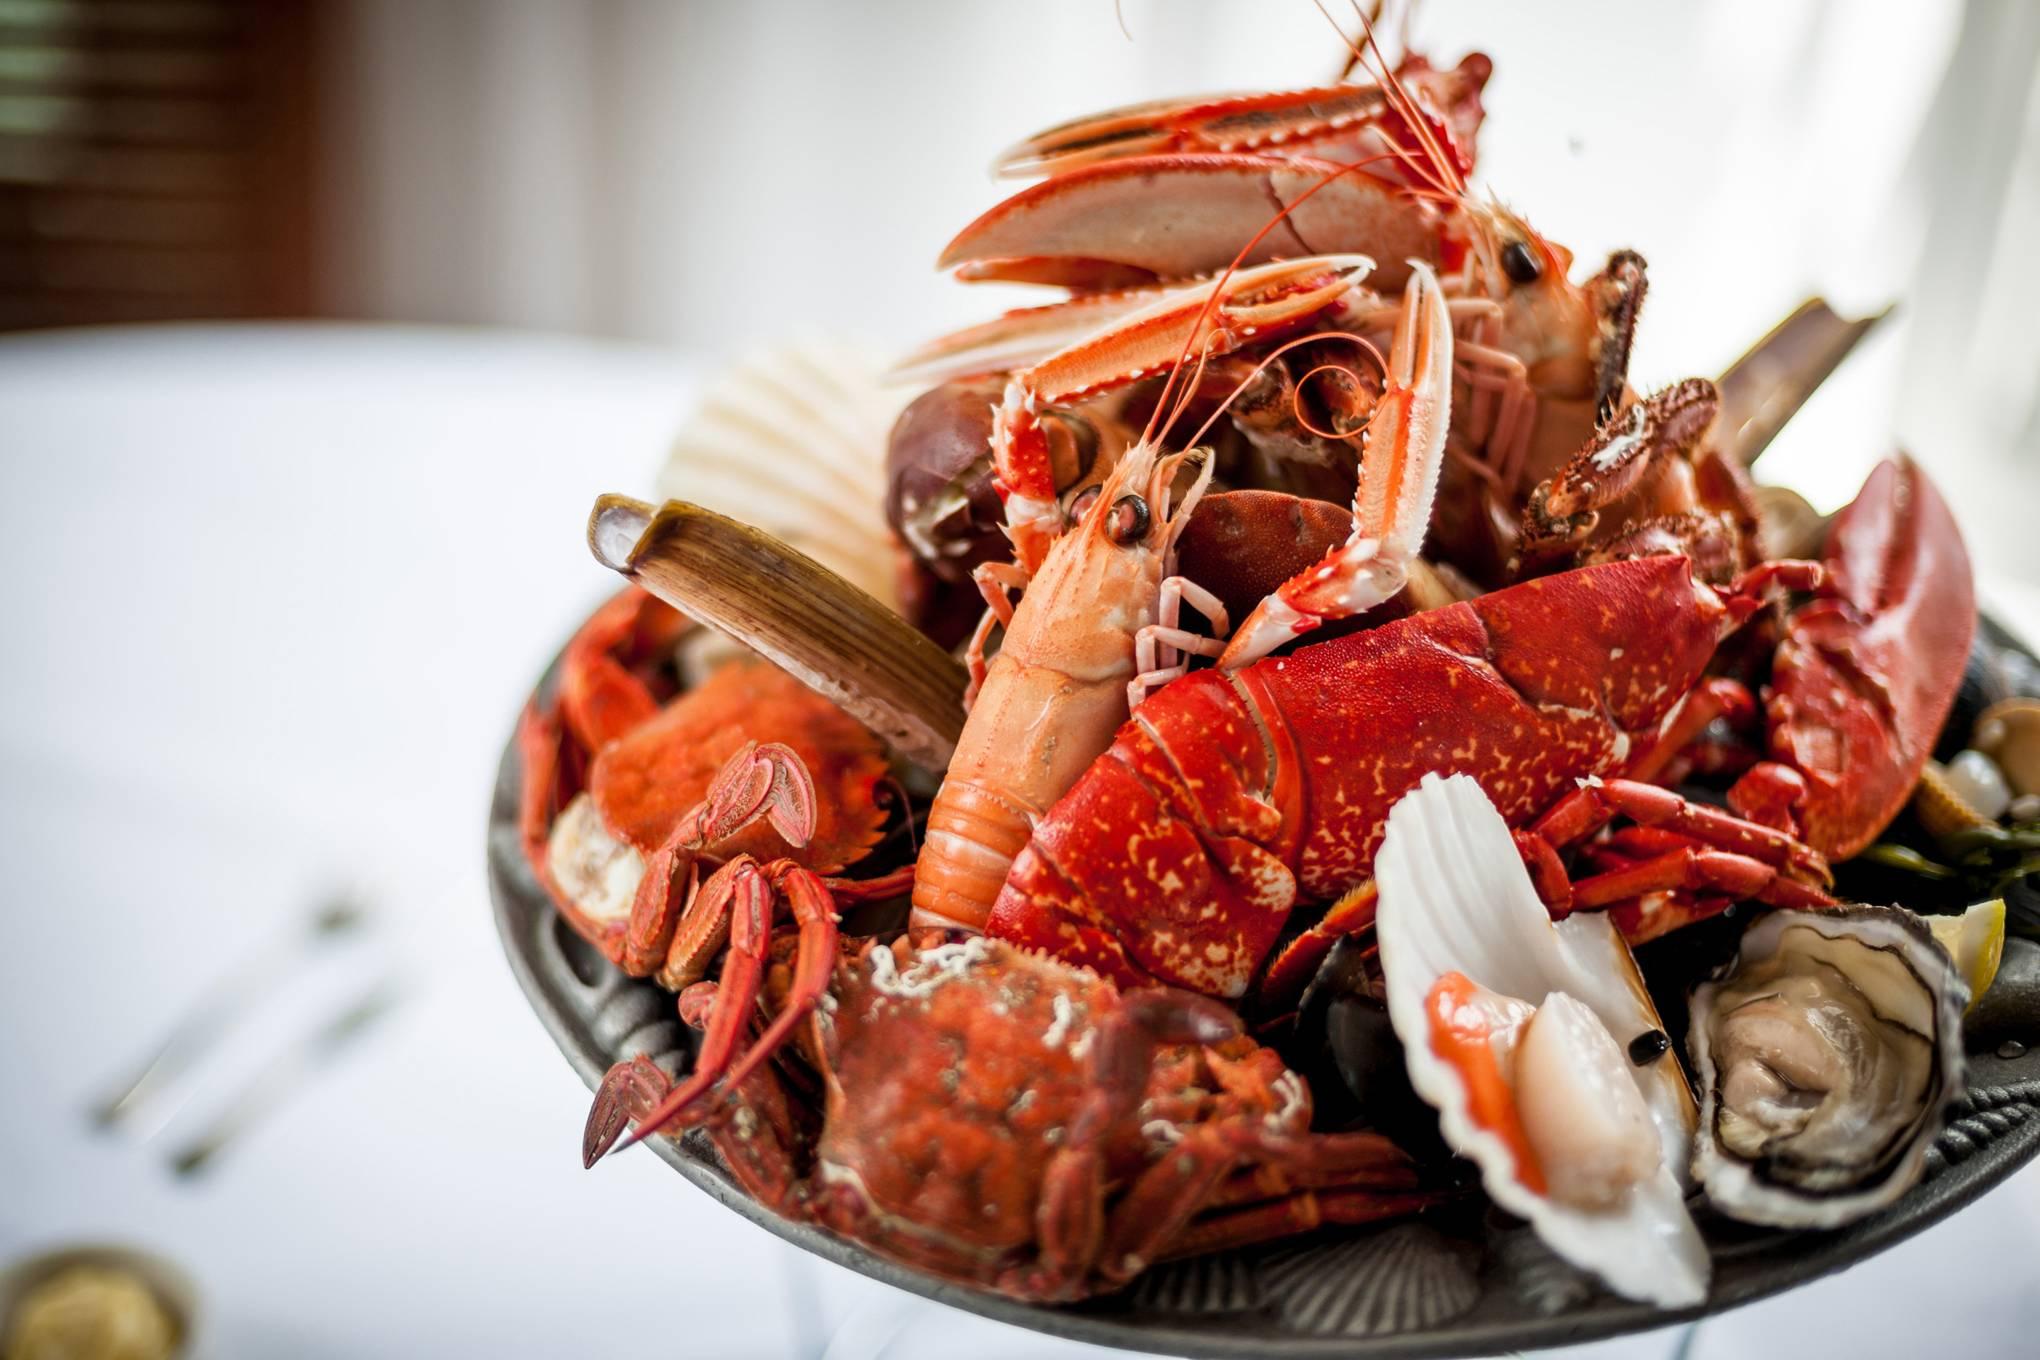 The Best Restaurants In Cornwall 15 Seaside Spots To Visit